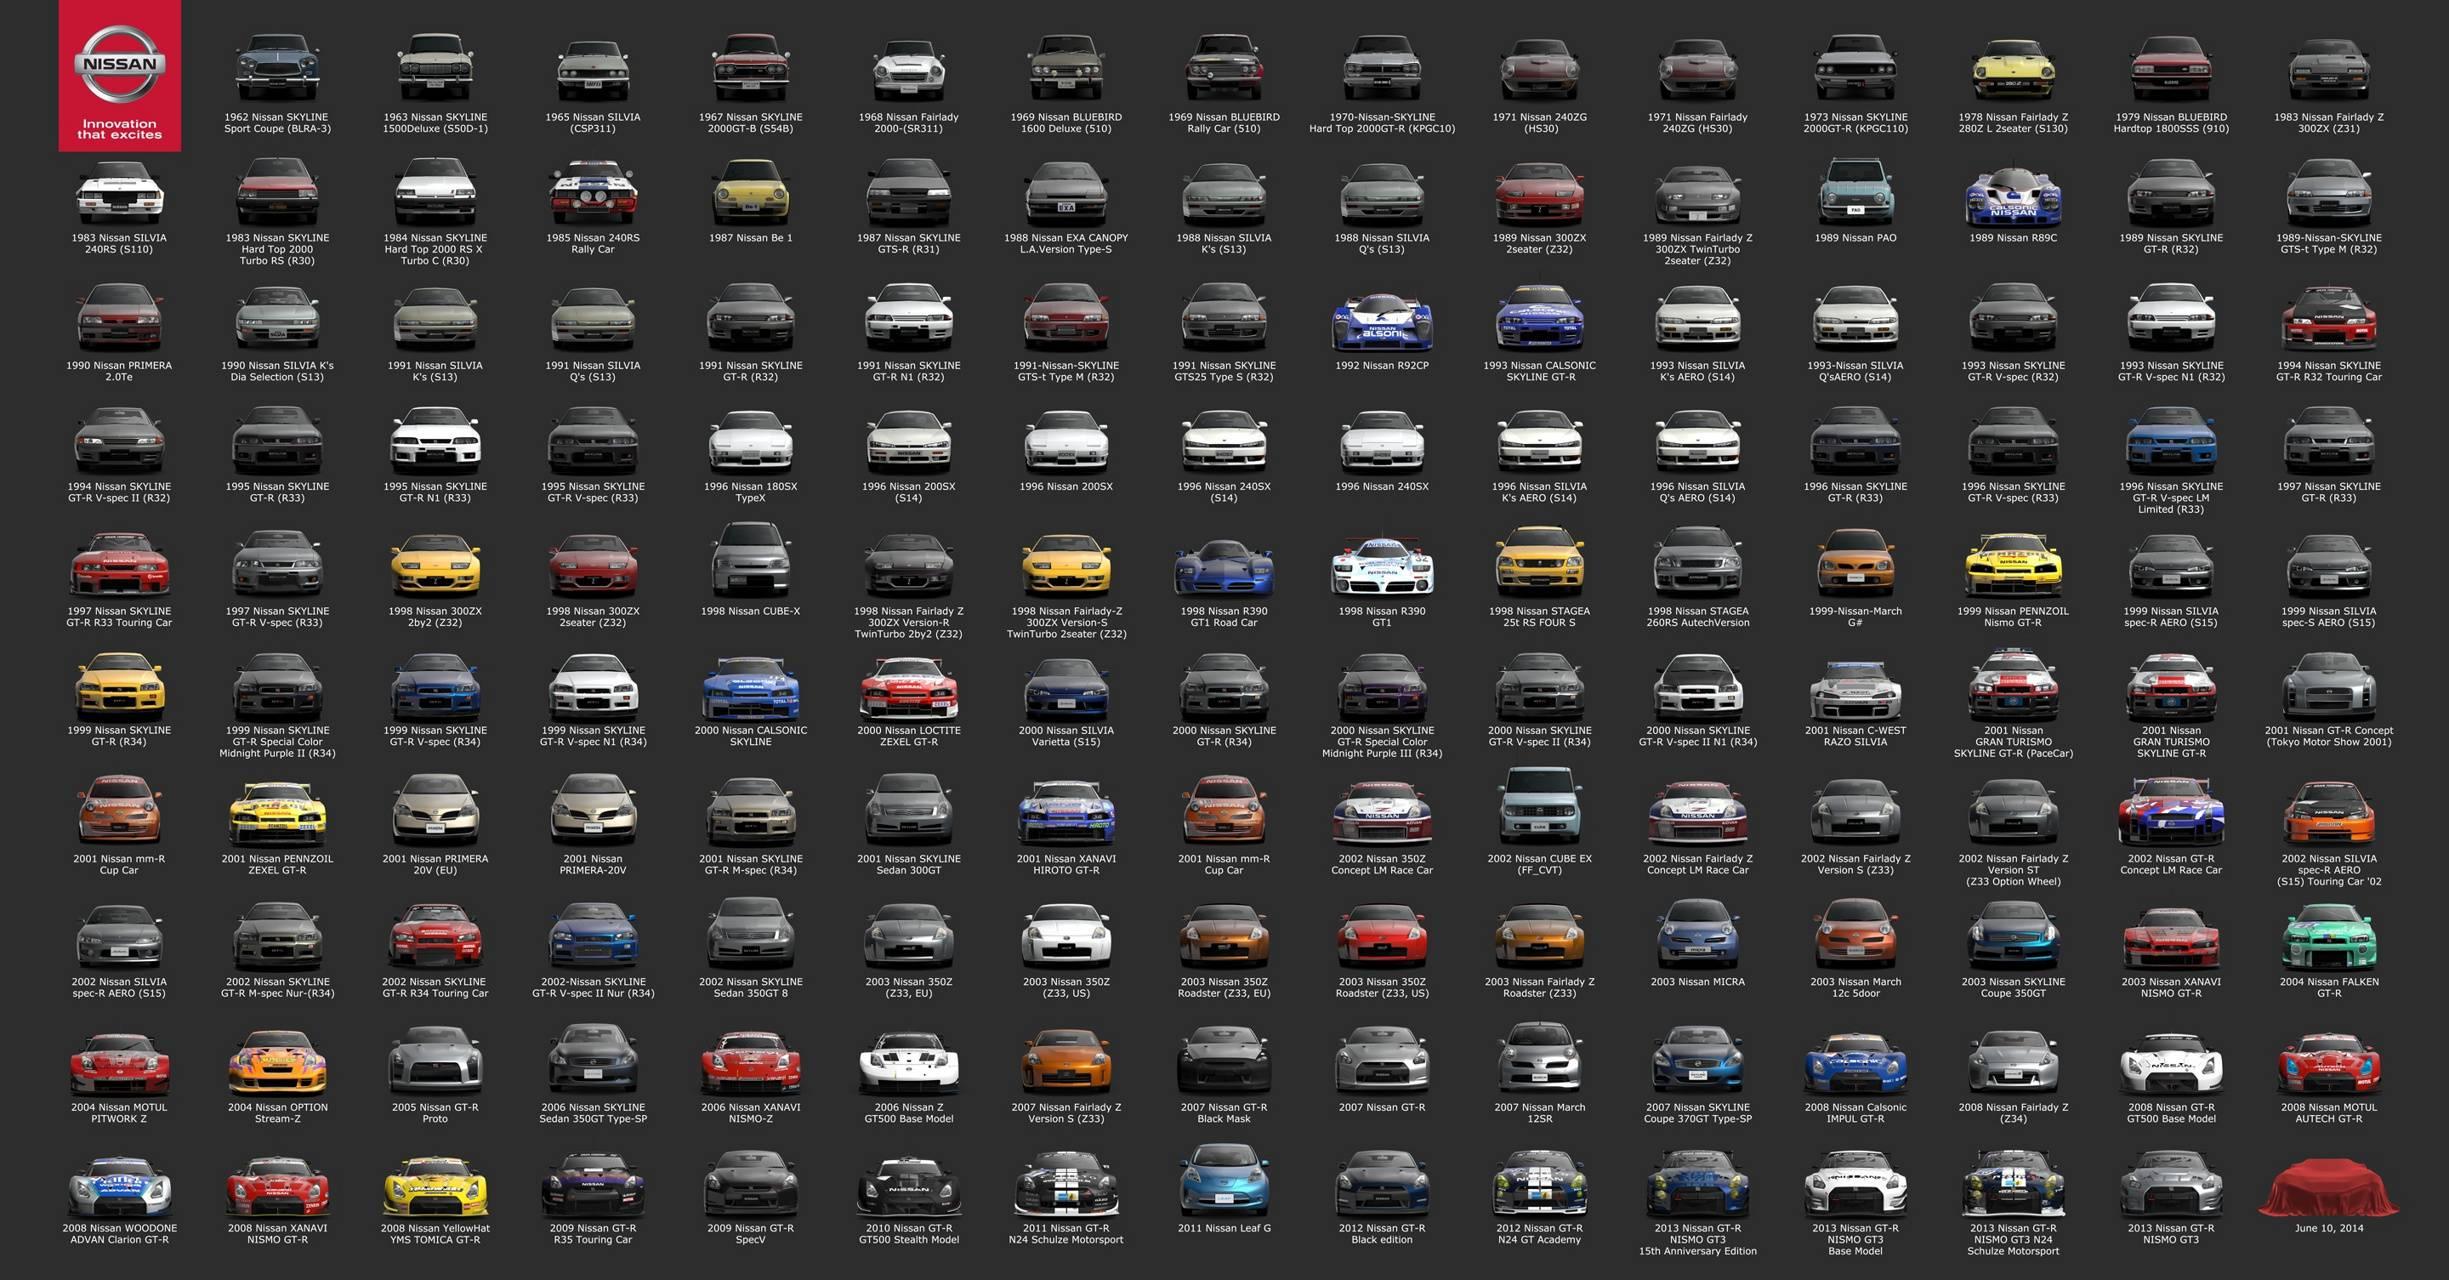 Nissan Nismo Cars